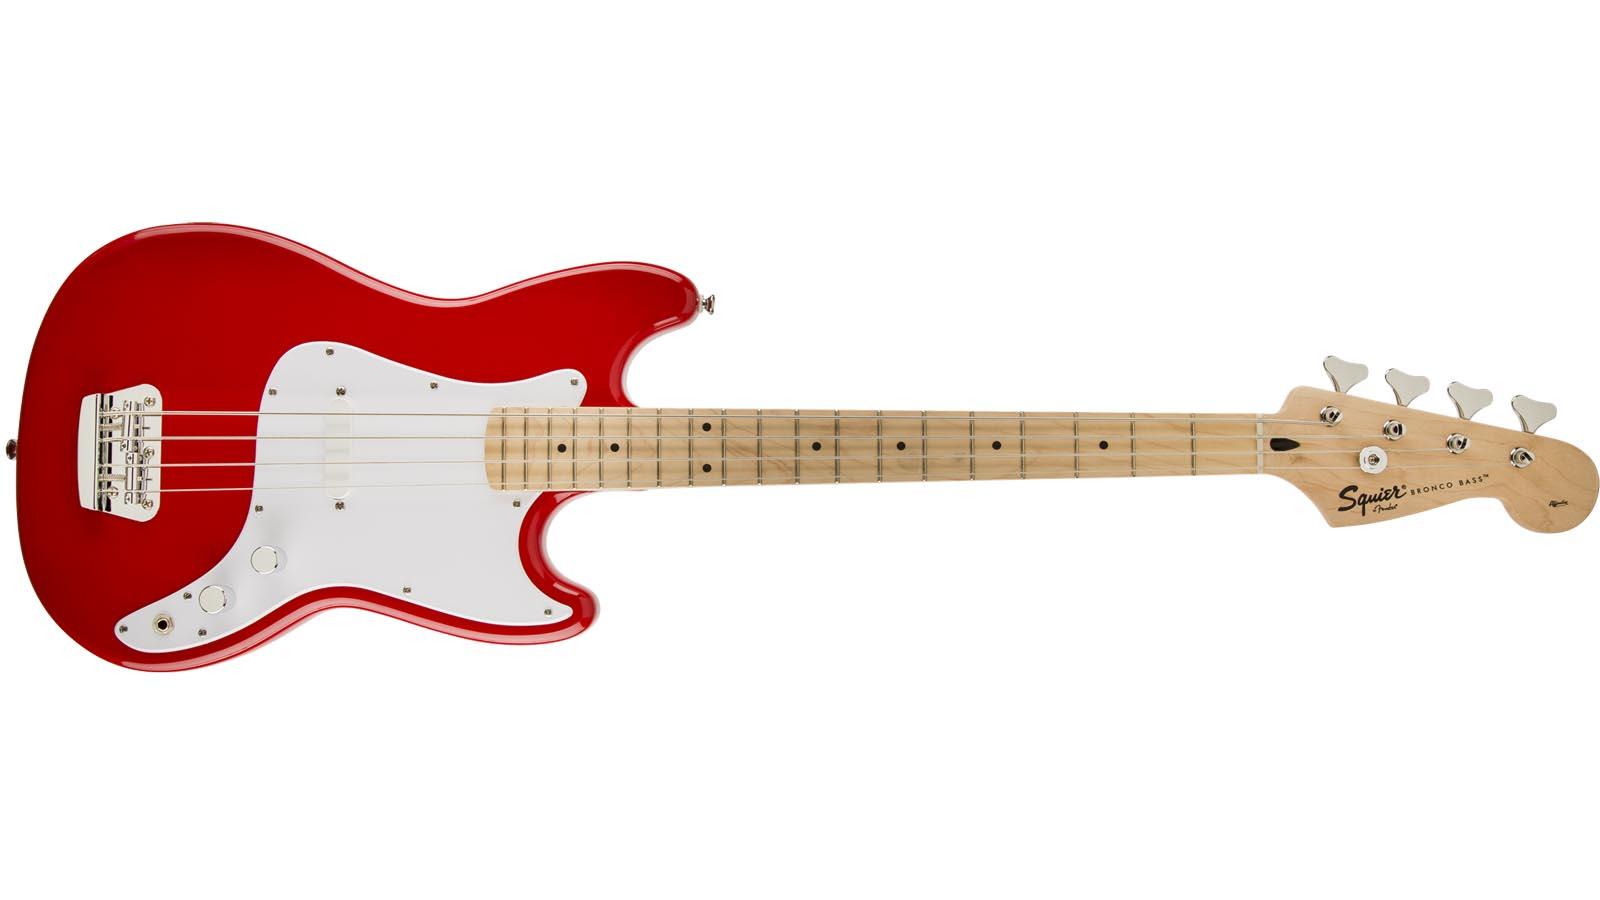 Fender Squier Bronco Bass Torino Red